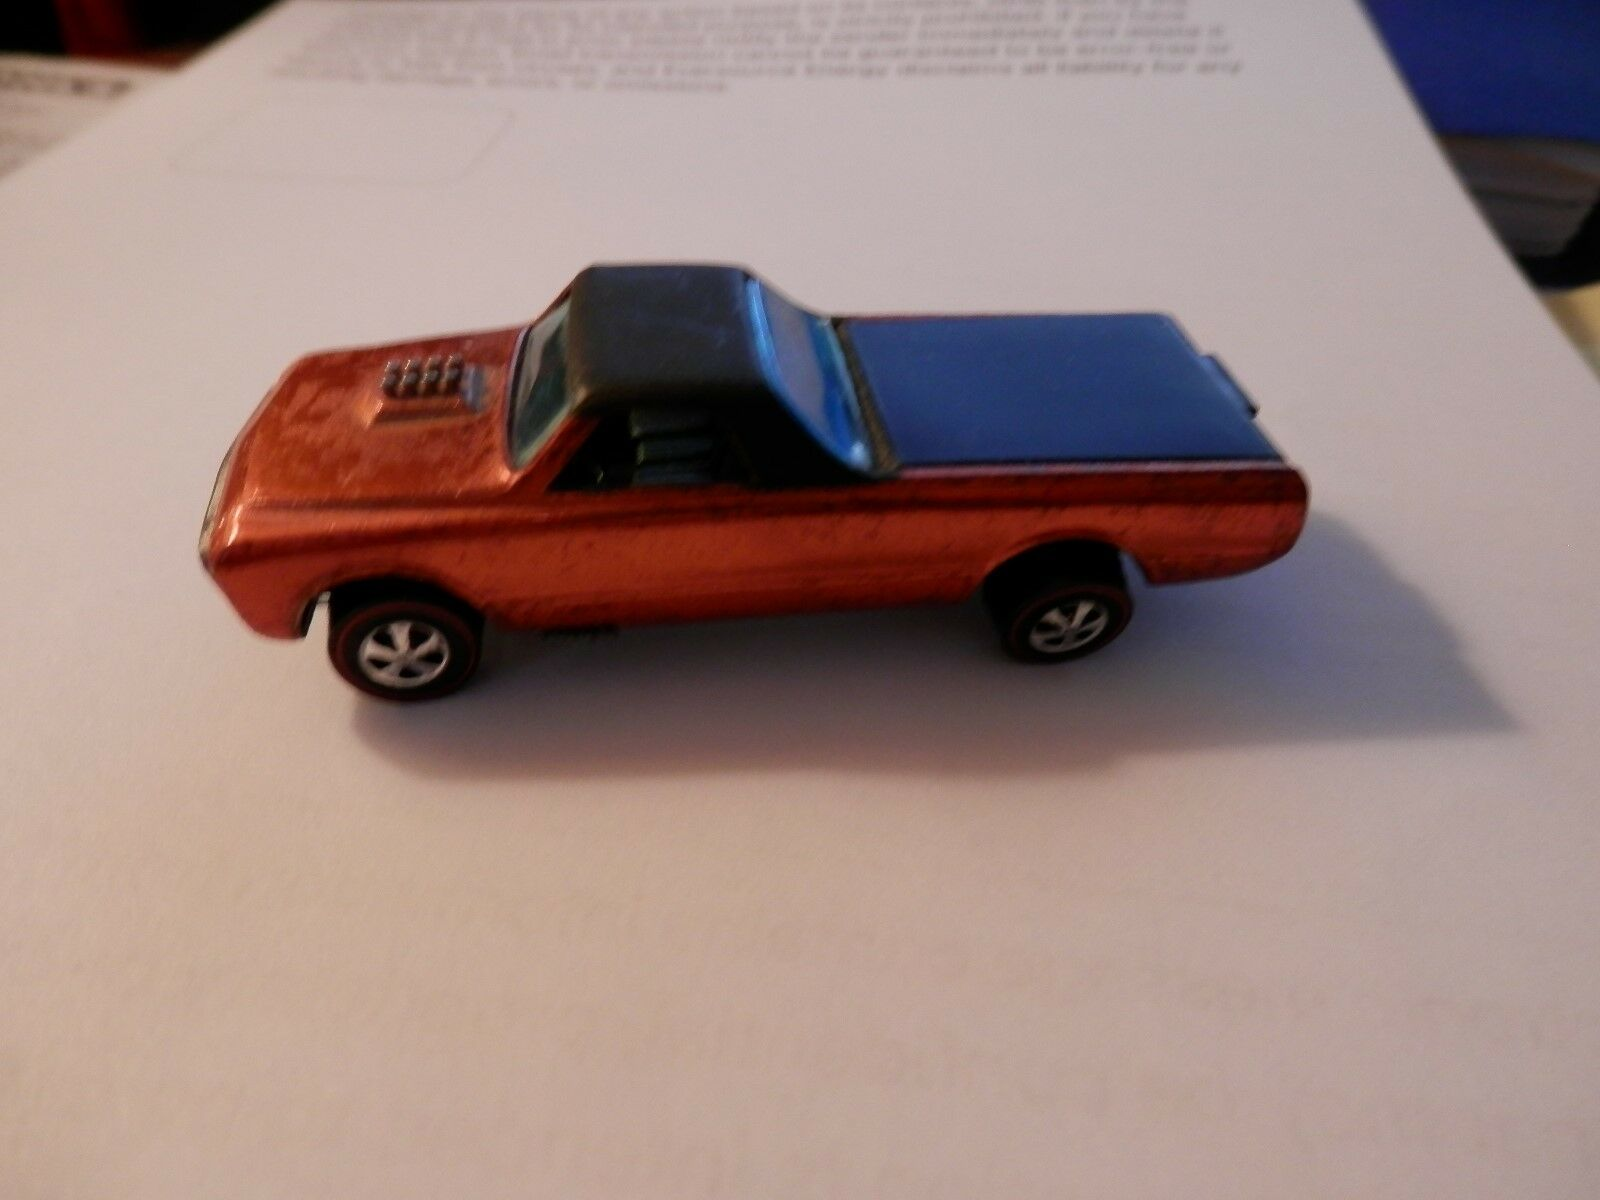 1967 Hot Wheels Red Line Classic Fleetside Metallic orange